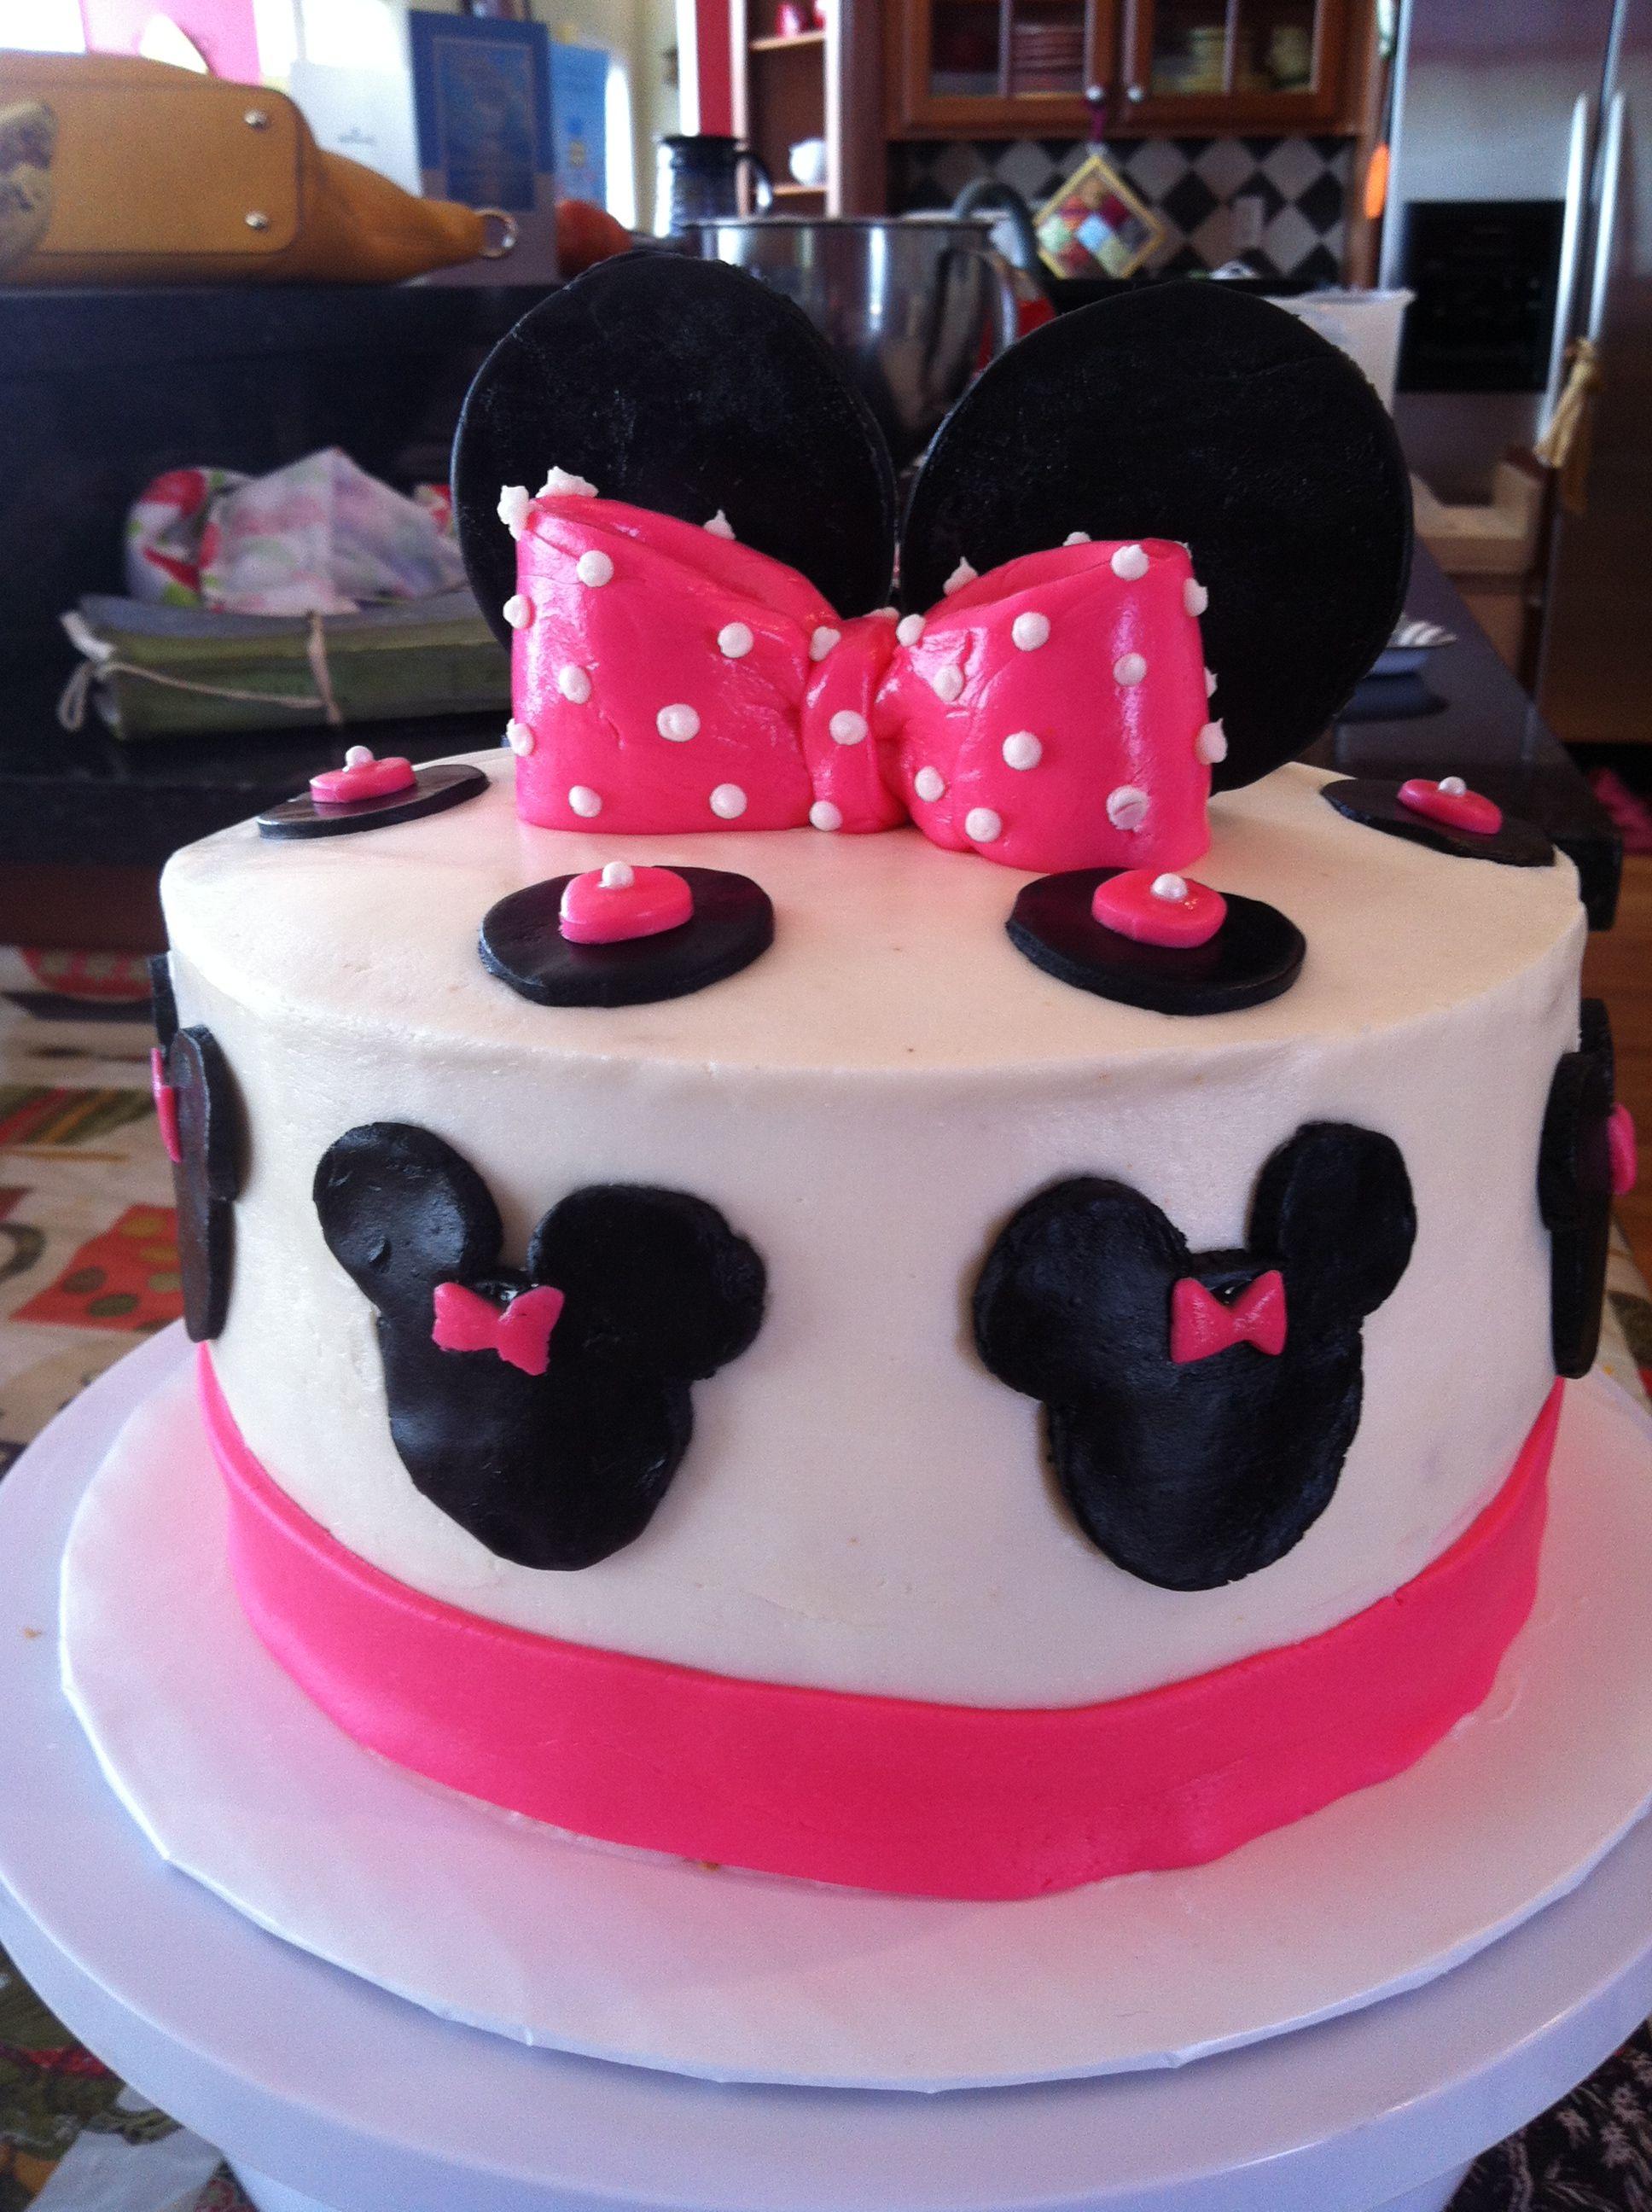 Cake Minnie Mouse Pinterest : Minnie Mouse cake JessieCakes Pinterest